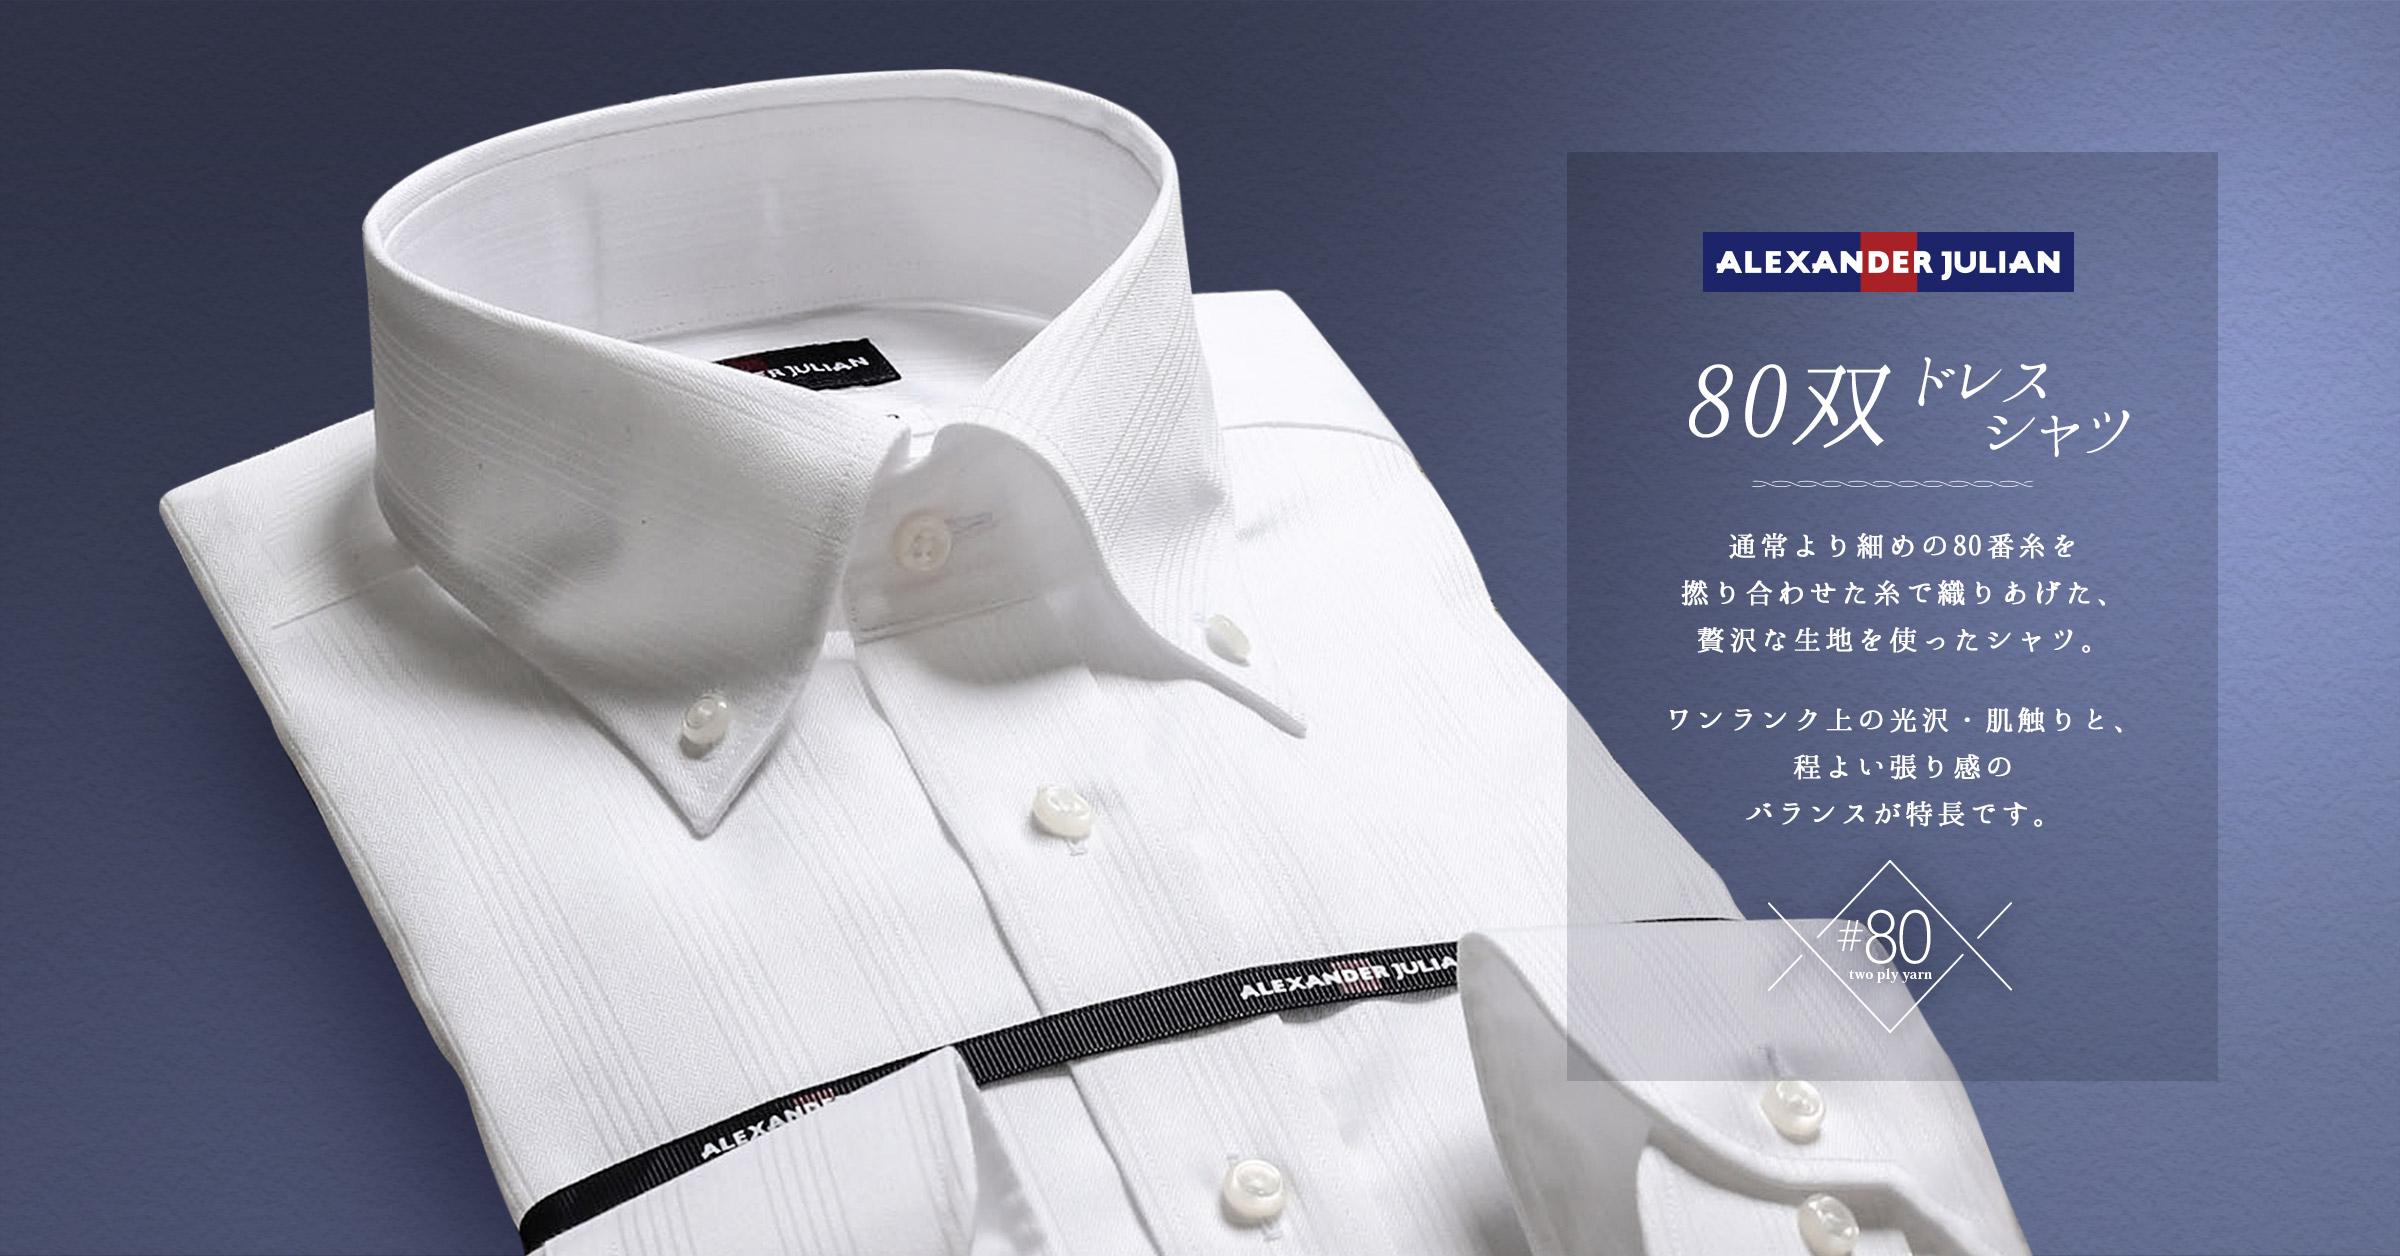 ALEXANDER JULIAN 80双ドレスシャツ